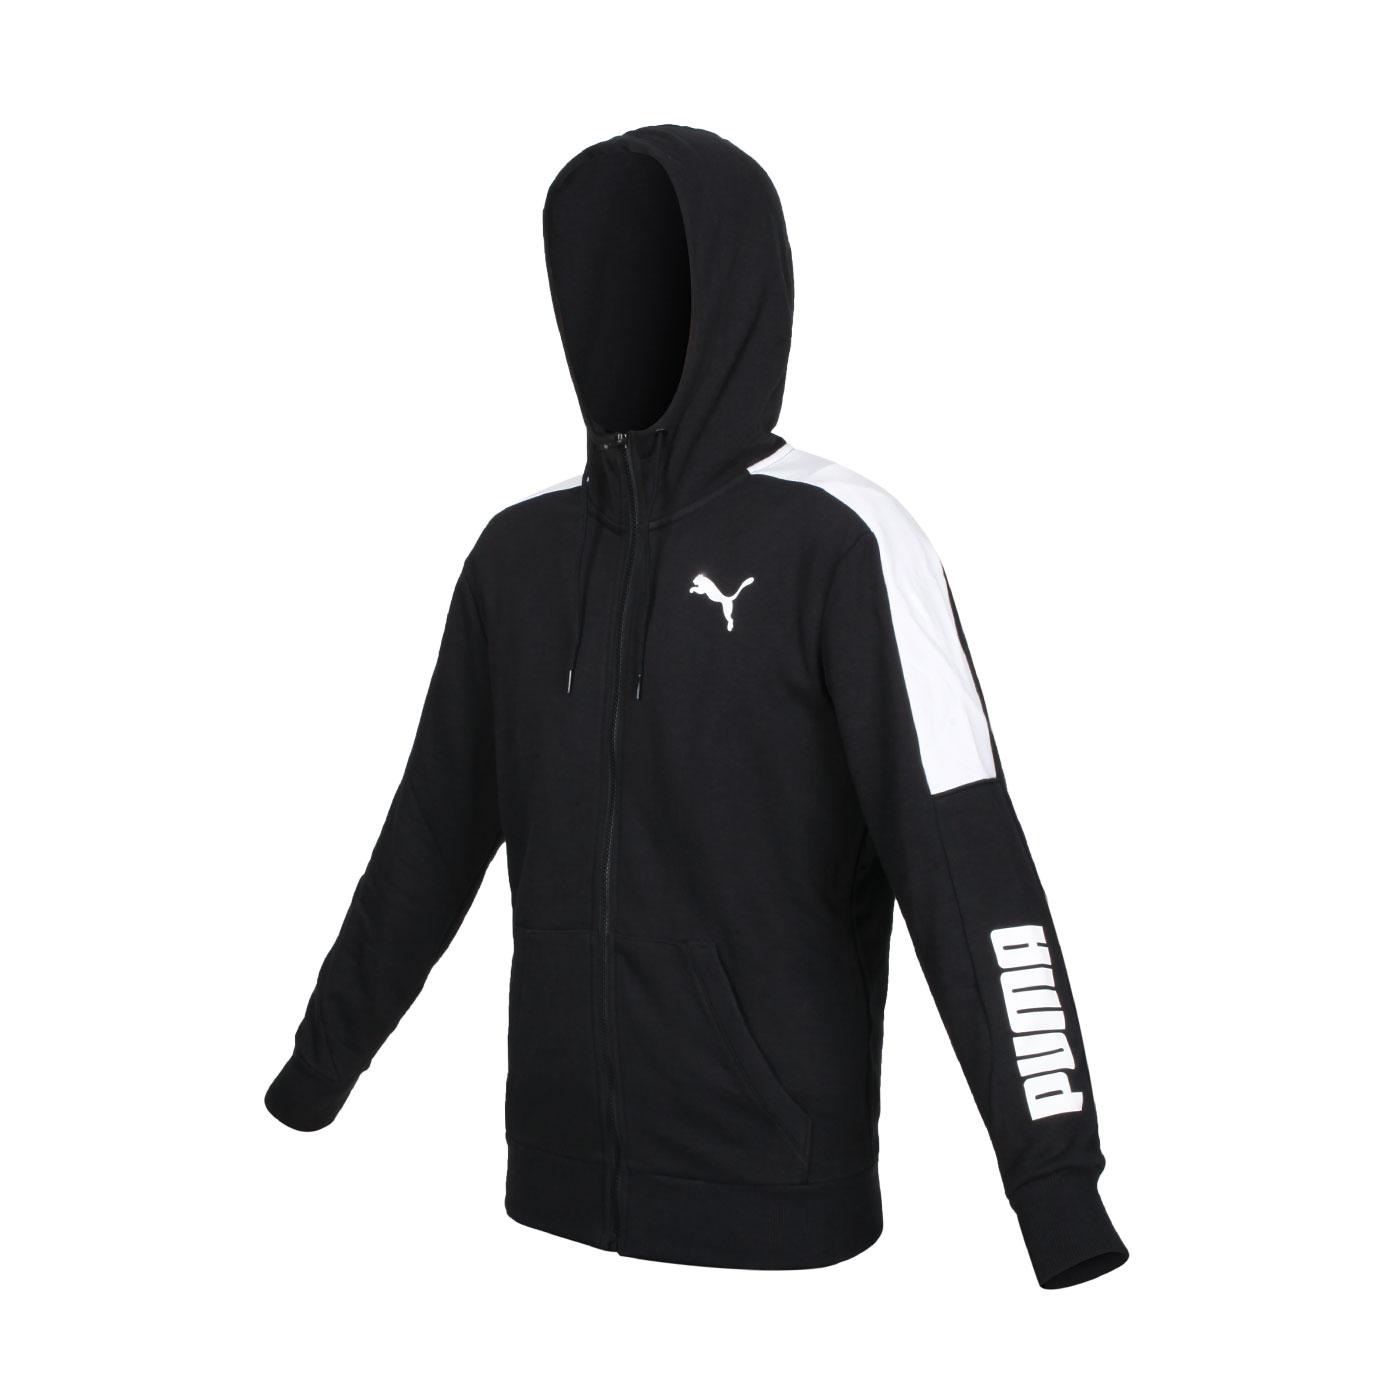 PUMA 男款基本系列Modren Sports連帽外套 58948001 - 黑白